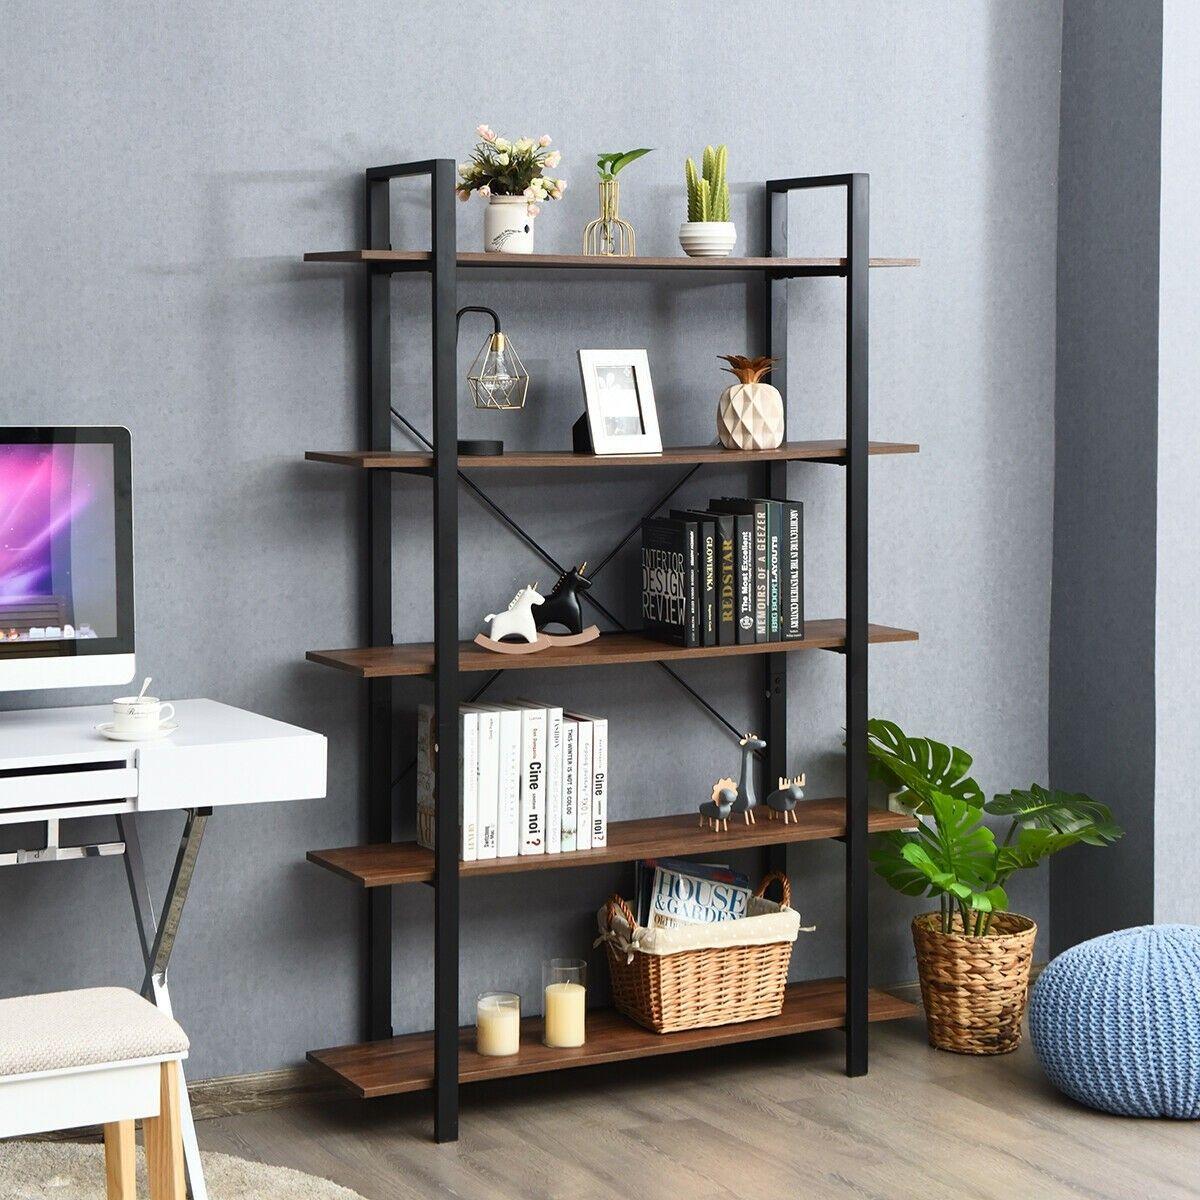 5 Tiers Bookshelf Industrial Bookcases Metal Frame Shelf Stand